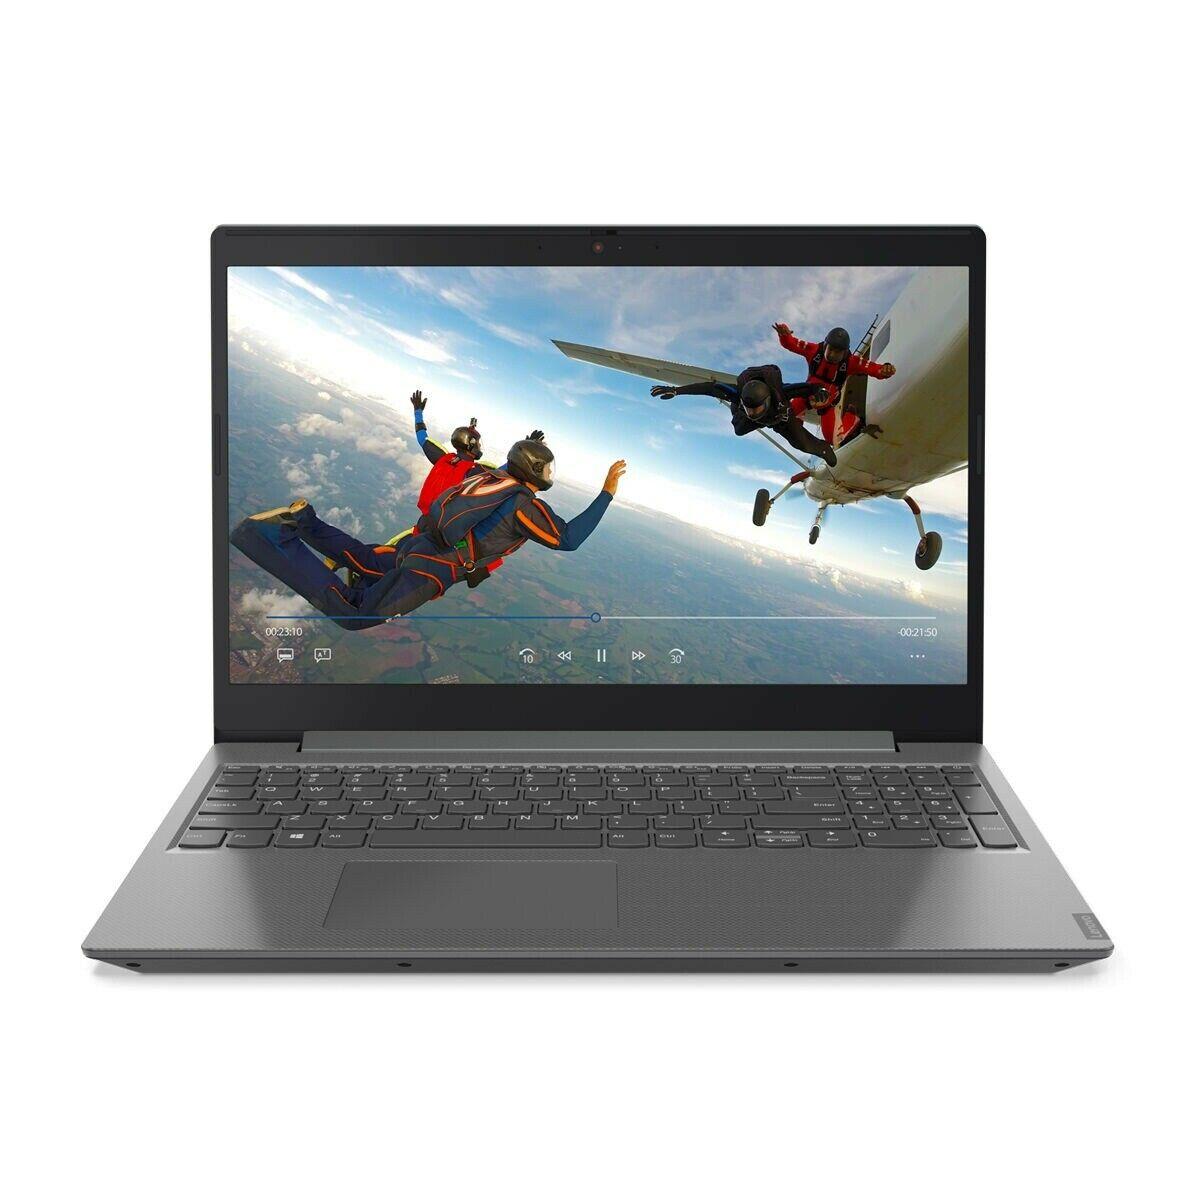 "Lenovo V155 15.6"" Laptop 1080p, AMD Ryzen 3 3200U, 8GB RAM, 256GB SSD, Win 10 - £275.99 With Code @ laptopoutletdirect Ebay"